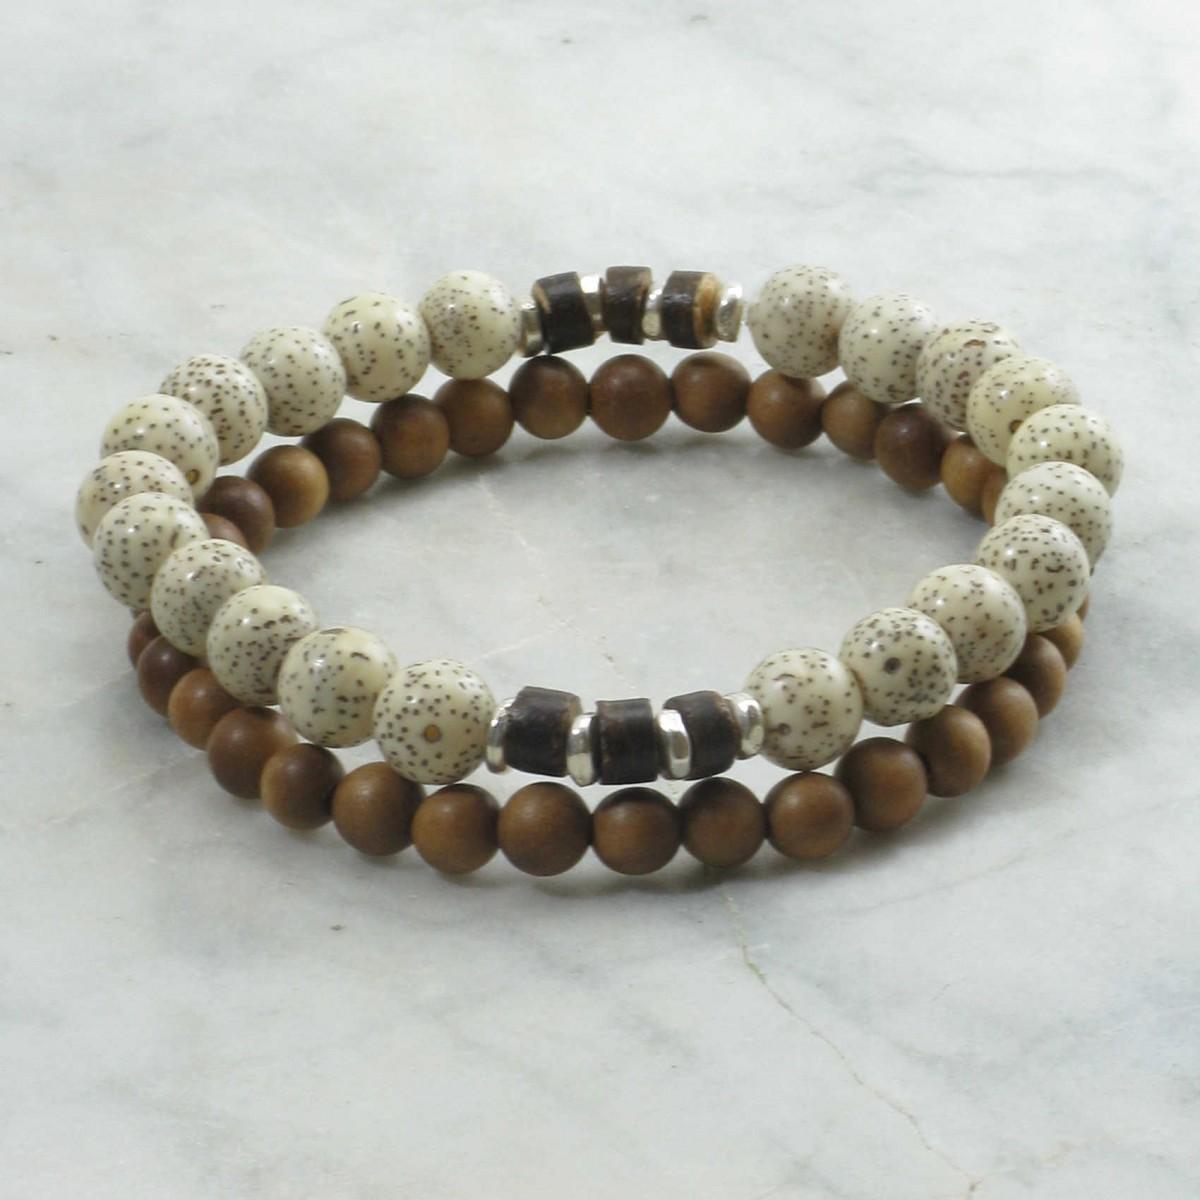 Savanna_Mala_Beads_for_Men_Bracelet_Stacks_Lotus_Seeds_Sandalwood_Buddhist_Prayer_Beads